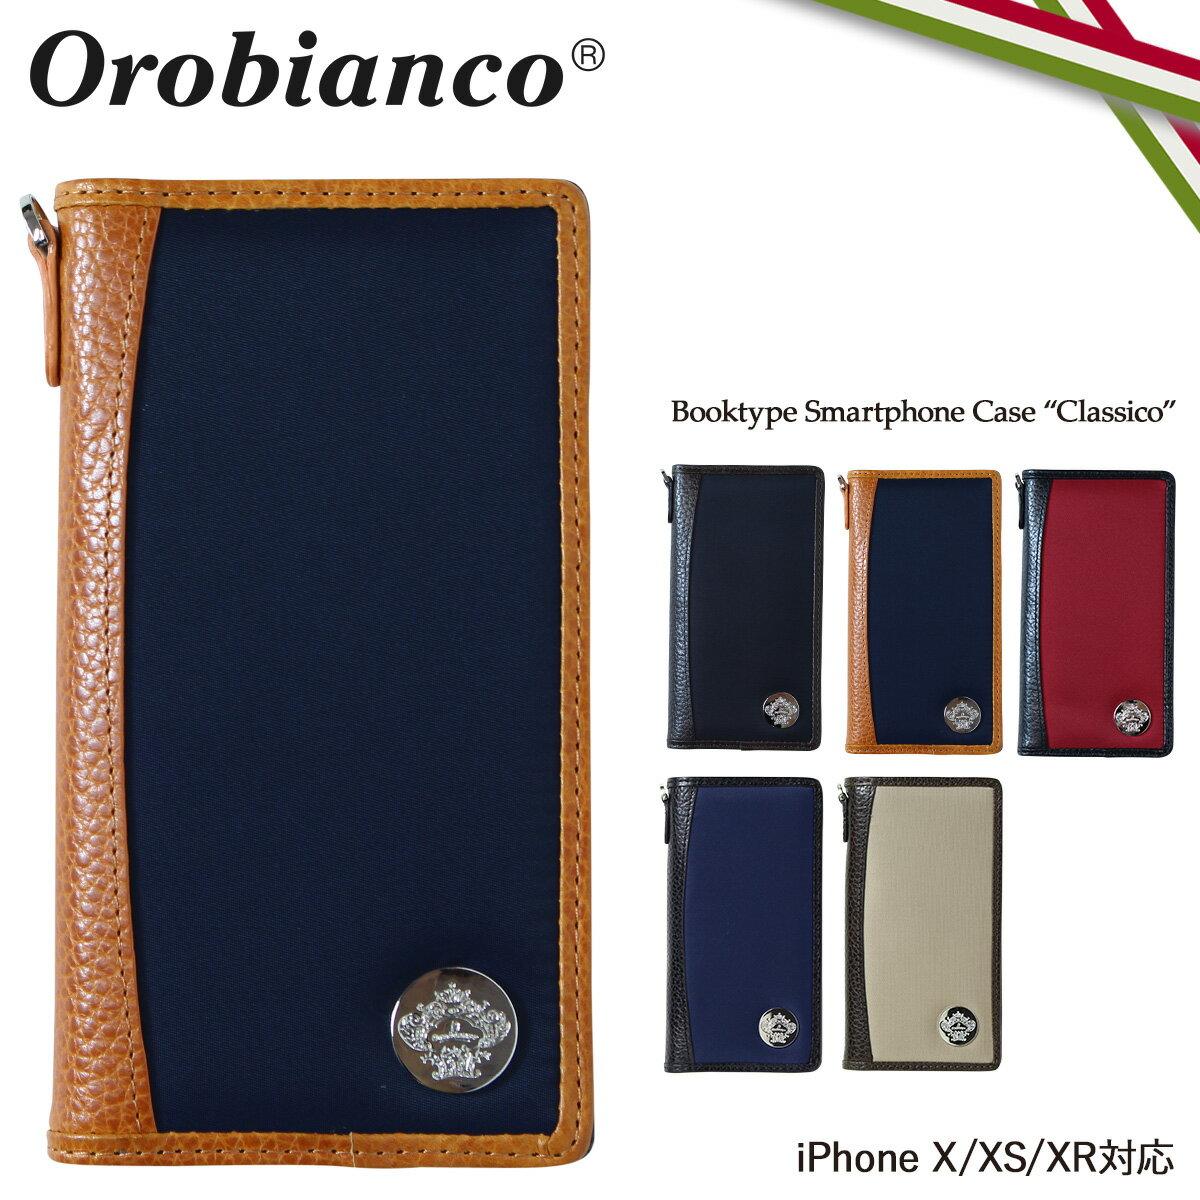 Orobianco オロビアンコ iPhone XR X XS ケース 手帳型 スマホ アイフォン CLASSICO レザー メンズ レディース ORIP-0001